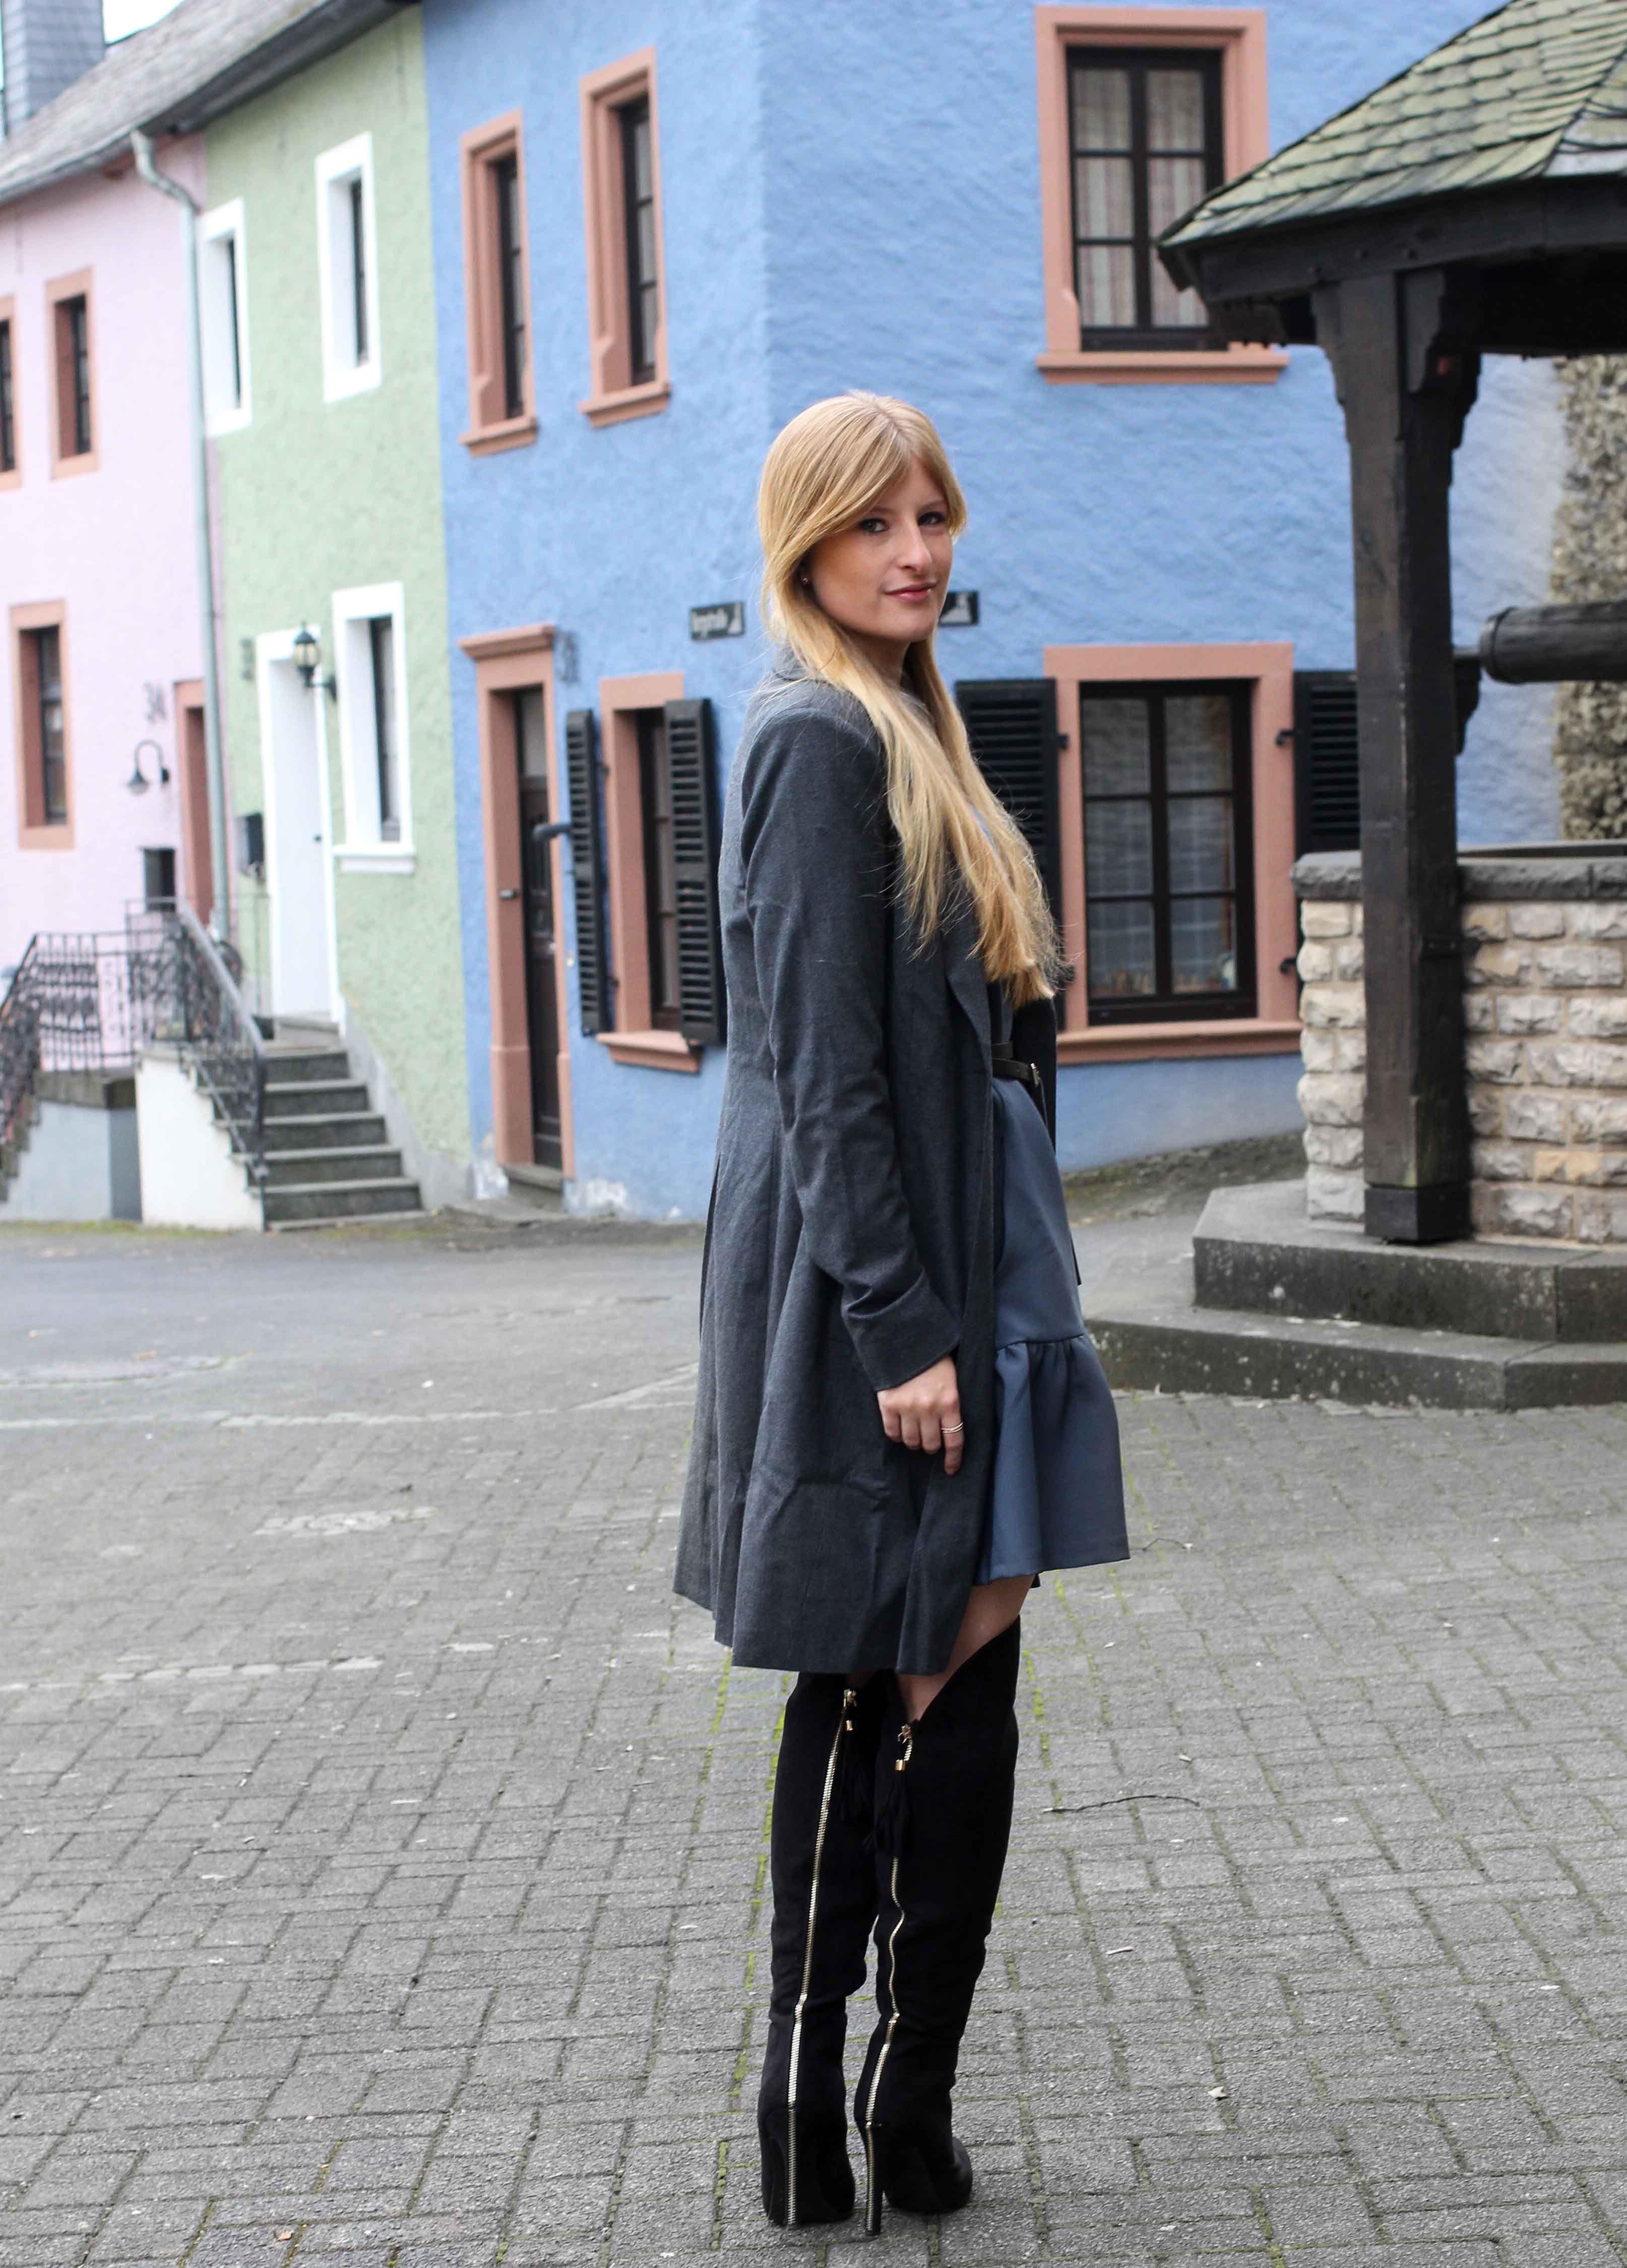 9a2e33444ab97 Blaues Winterkleid Closet London schwarze Overknees grauer Mantel Winter  Outfit Modeblog steetstyle lookbook blogger